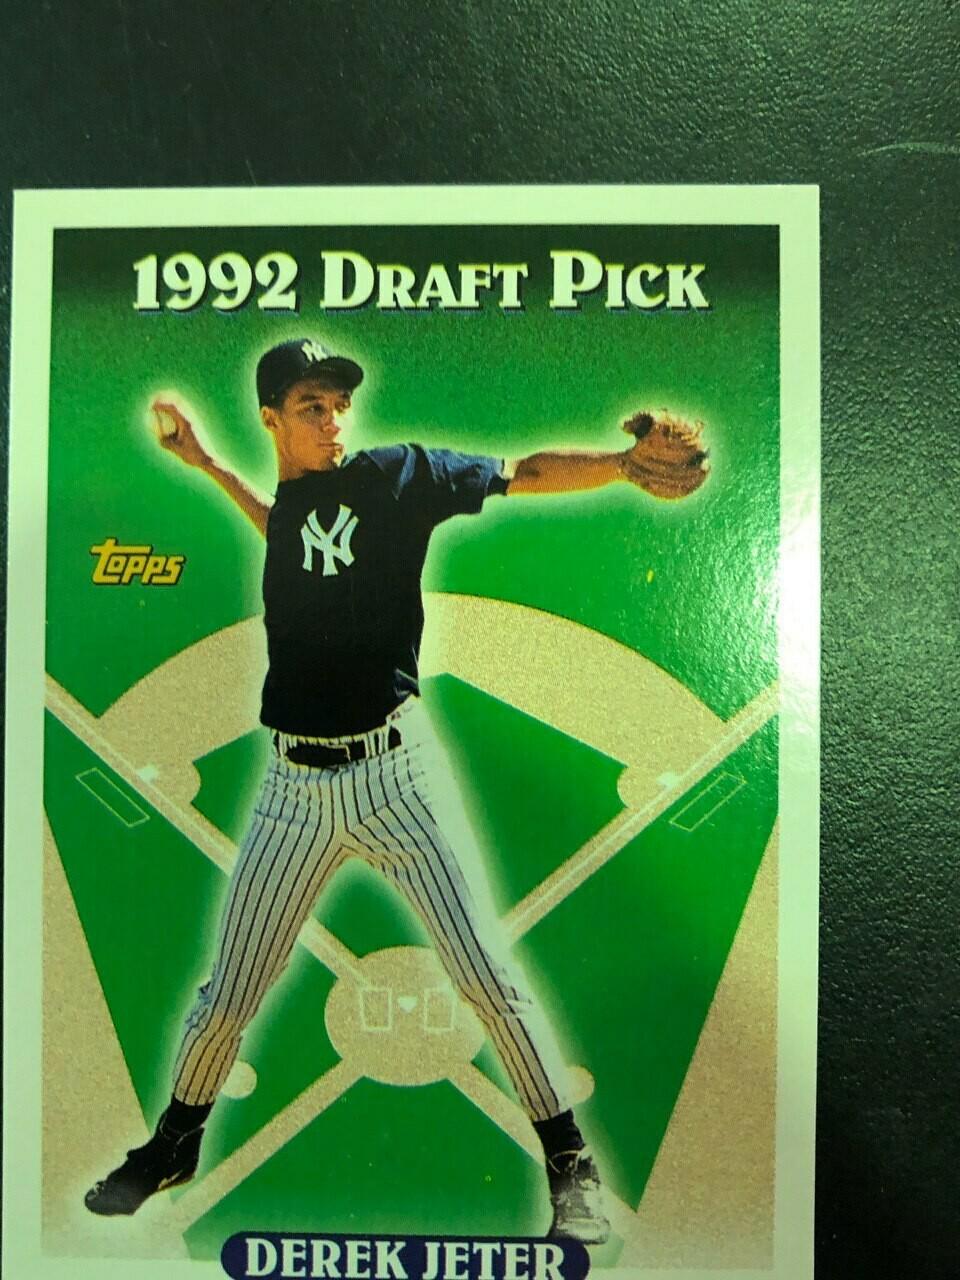 1993 Topps Derek Jeter rookie, $25